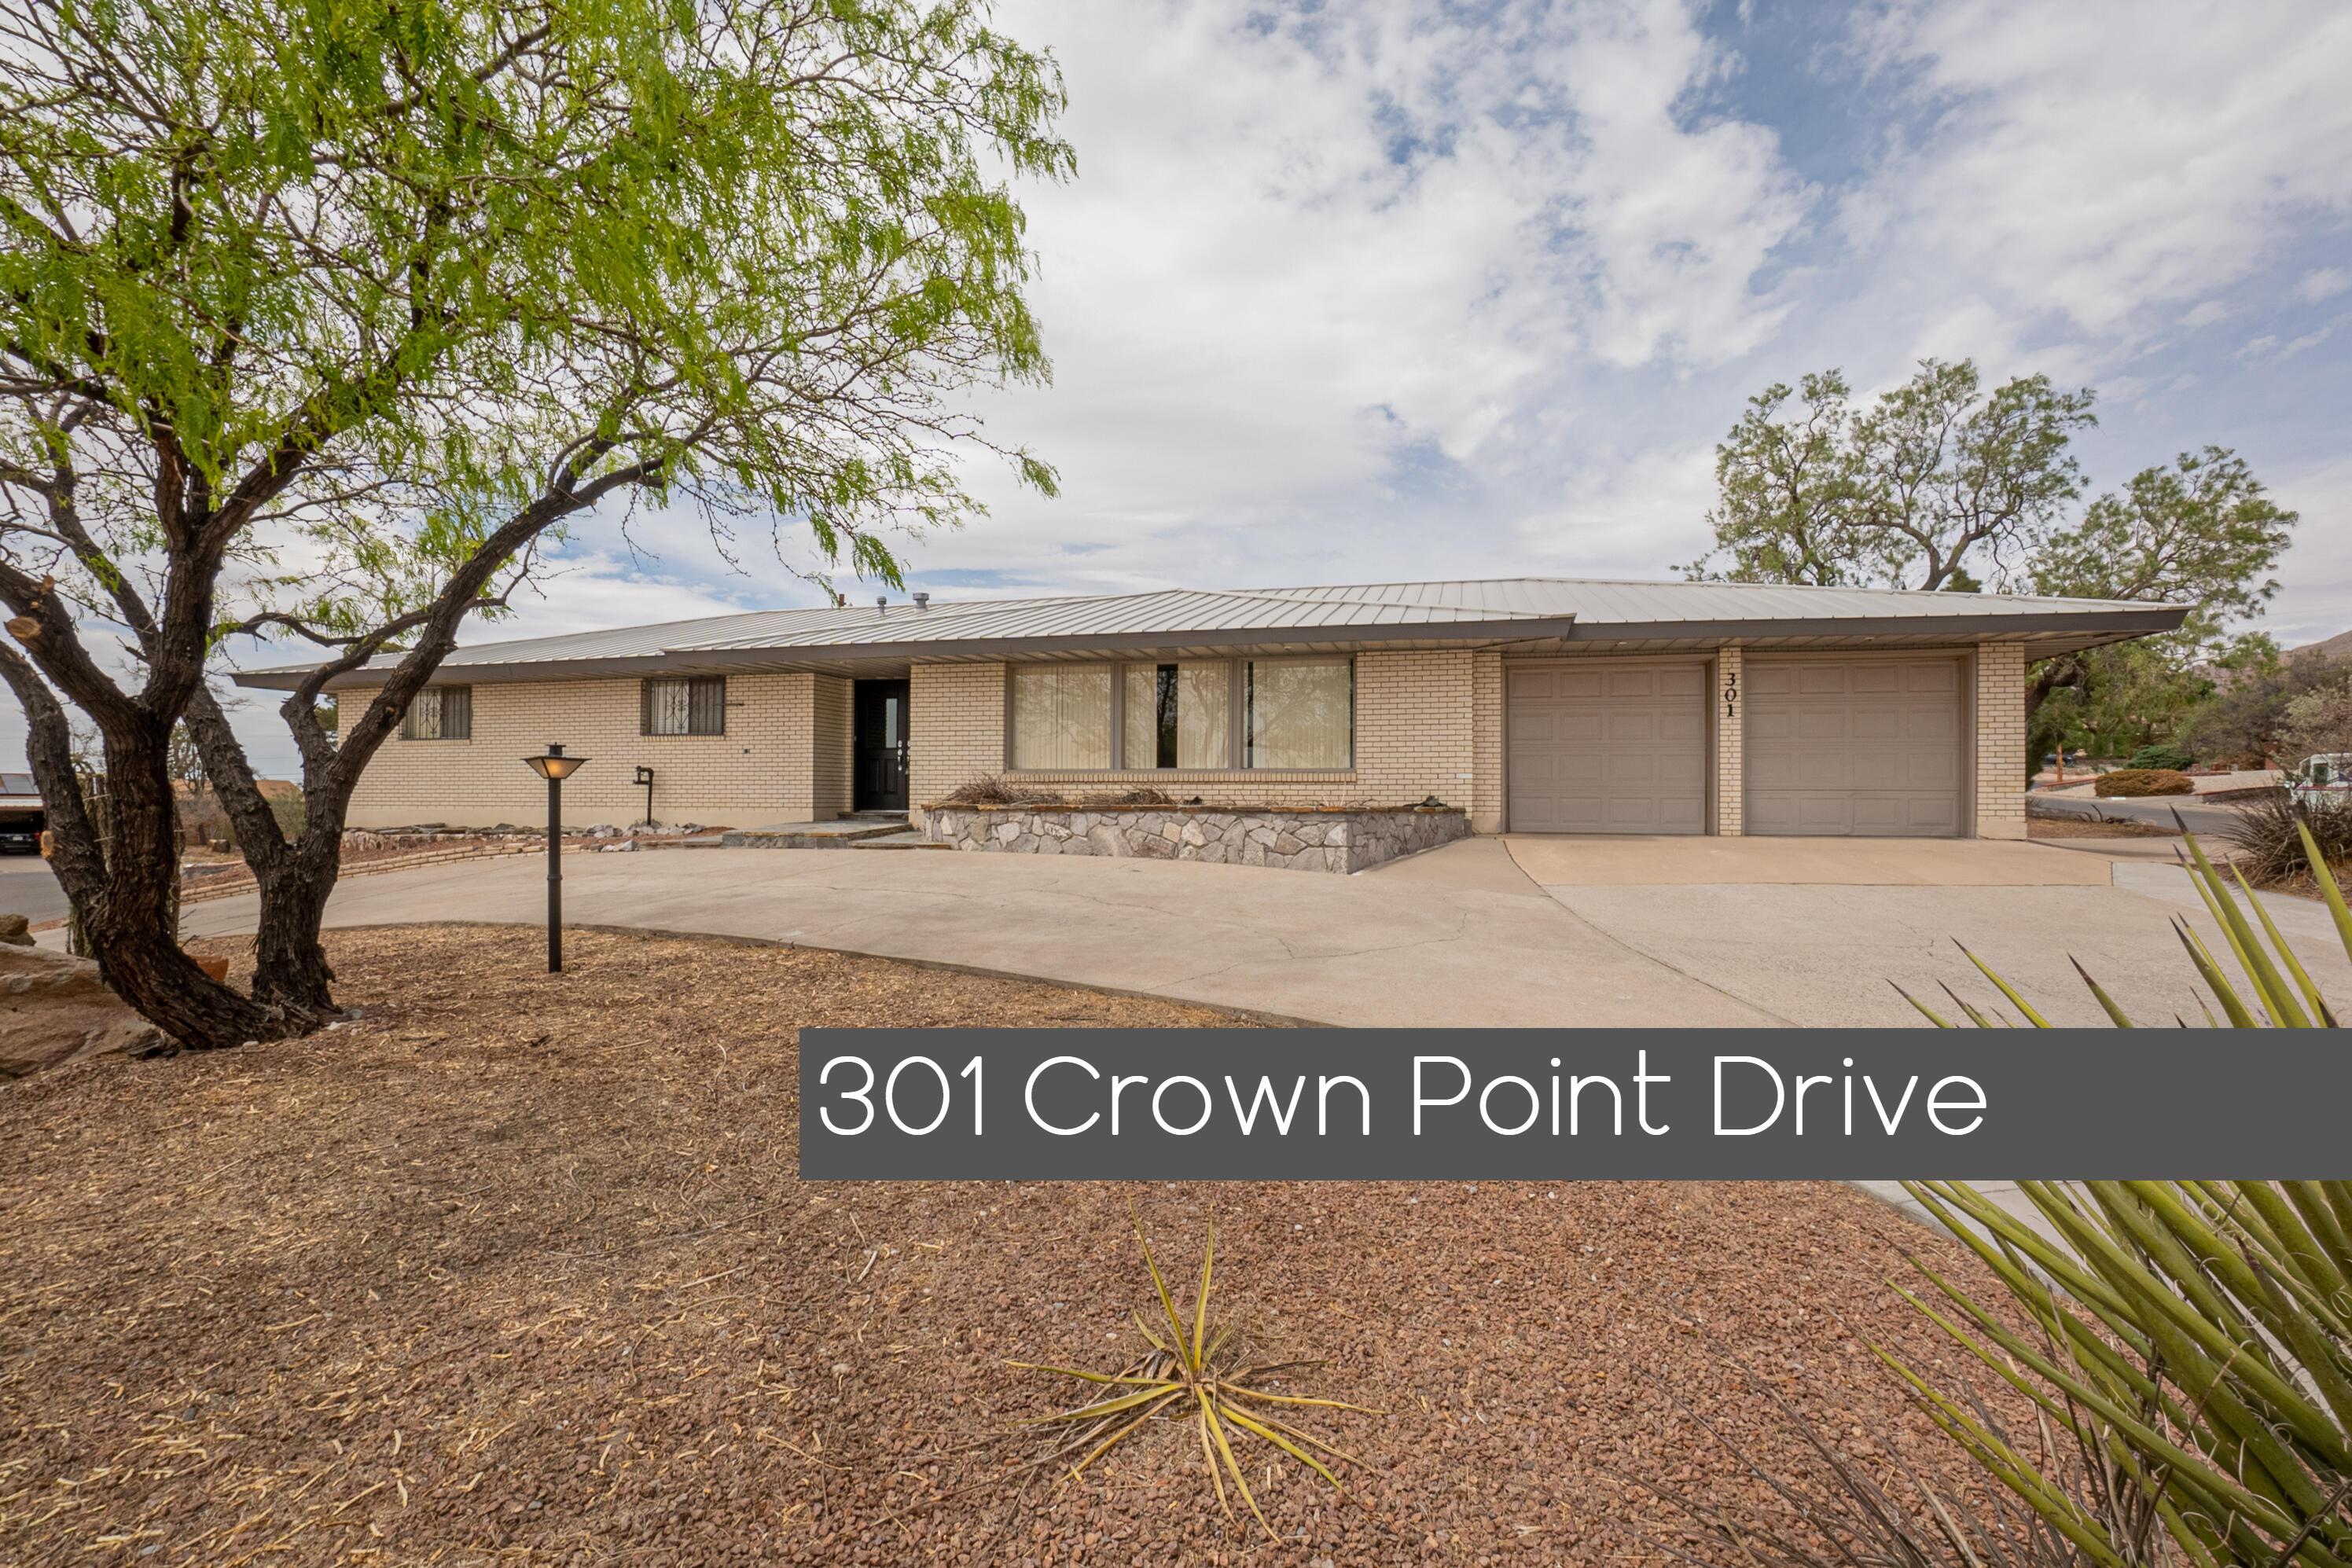 301 Crown Point, El Paso, Texas 79912, 3 Bedrooms Bedrooms, ,2 BathroomsBathrooms,Residential,For sale,Crown Point,844313